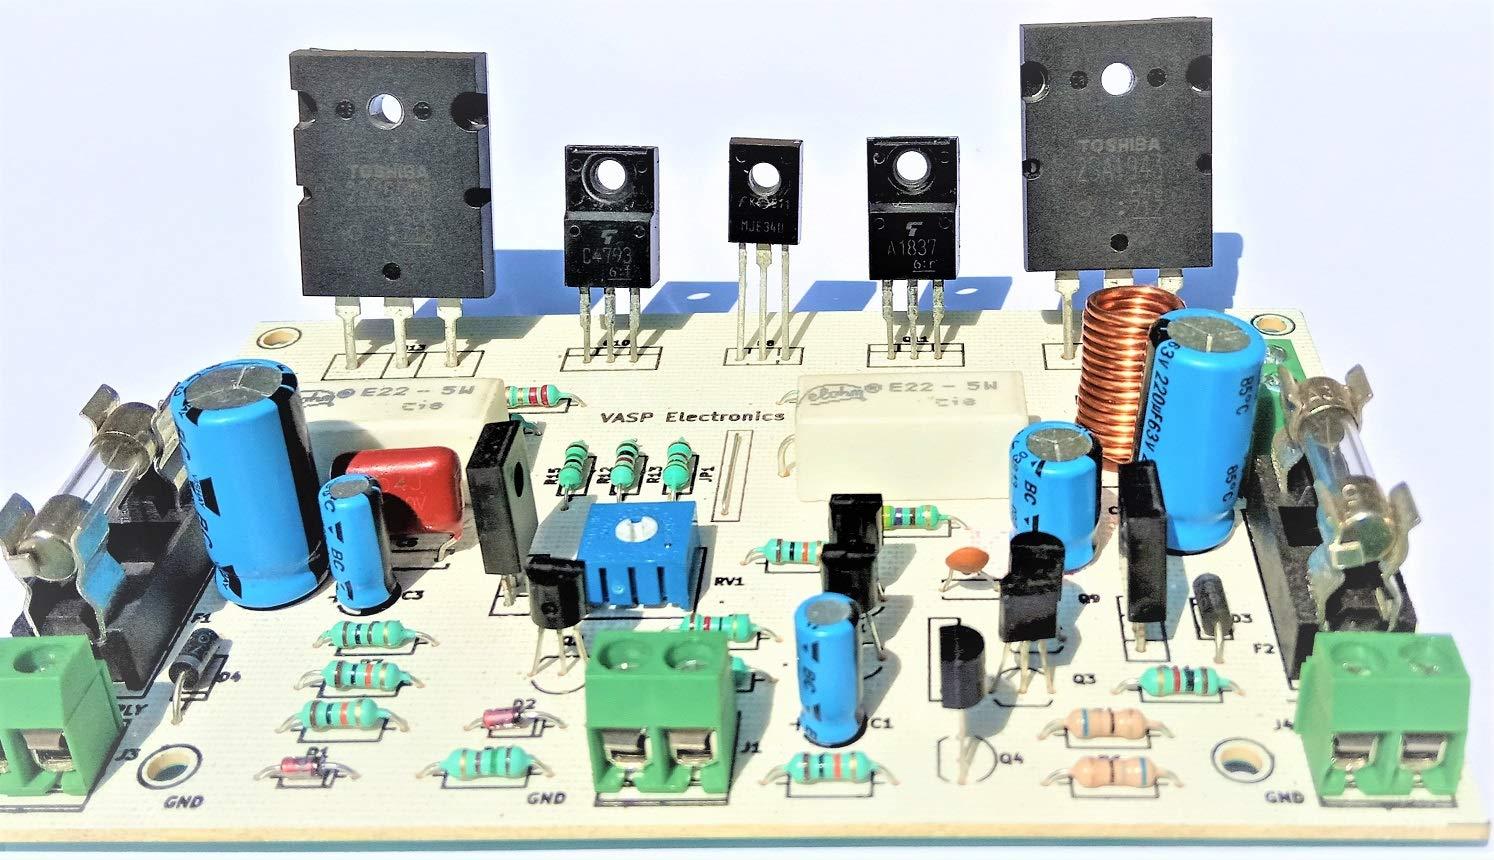 Vasp Electronics 100 Watt HIFI Audio Power Amplifier Using 2SC5200 2SA1943  Transistors - 1 Piece